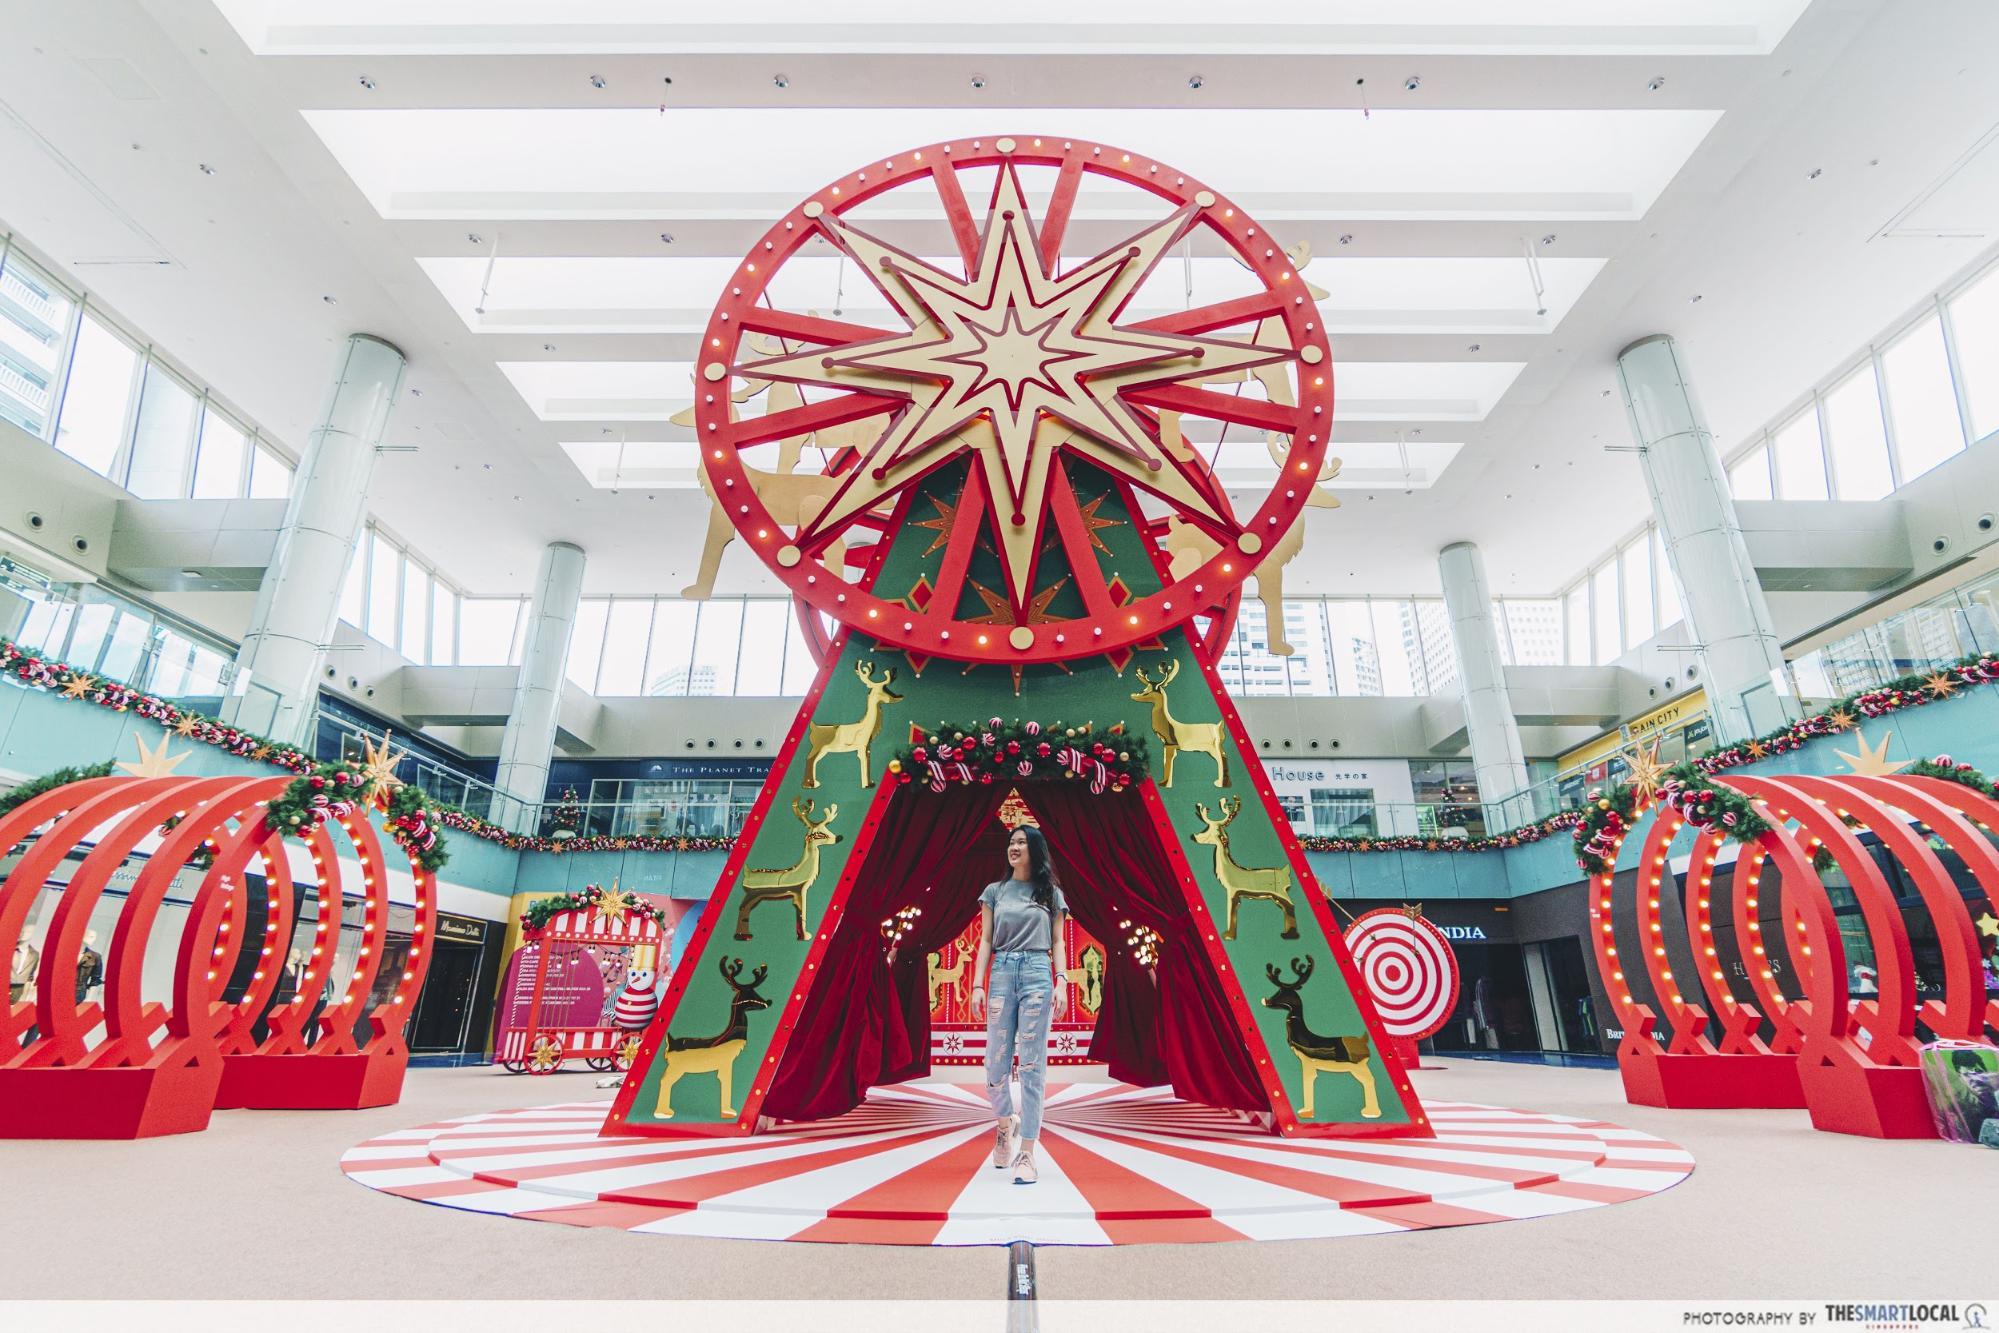 Marina Square Christmas decor